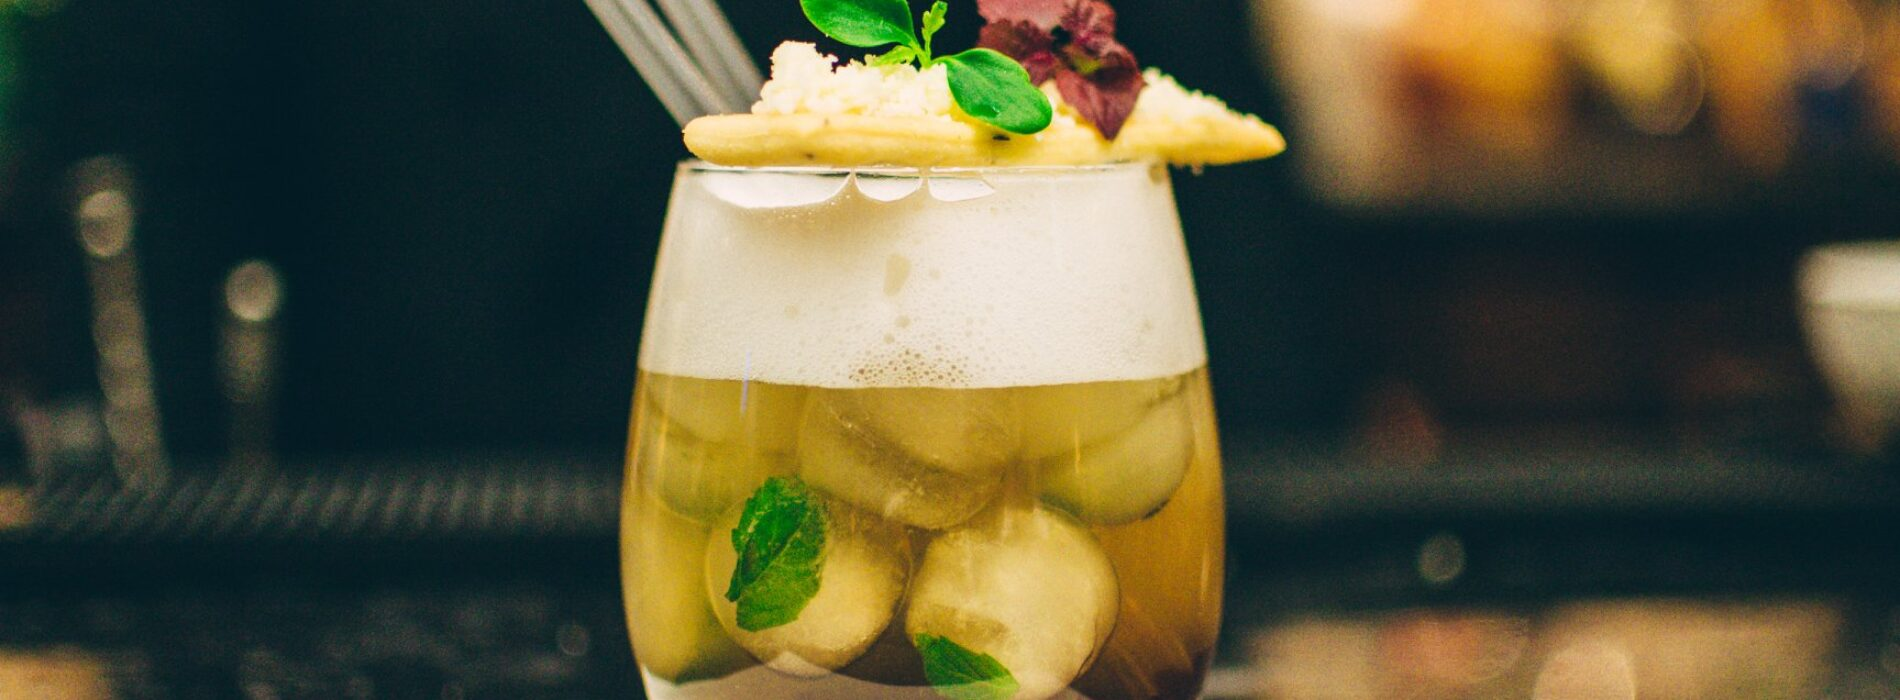 Florence Cocktail Week 2020, torna a Firenze la settimana dedicata alla mixology